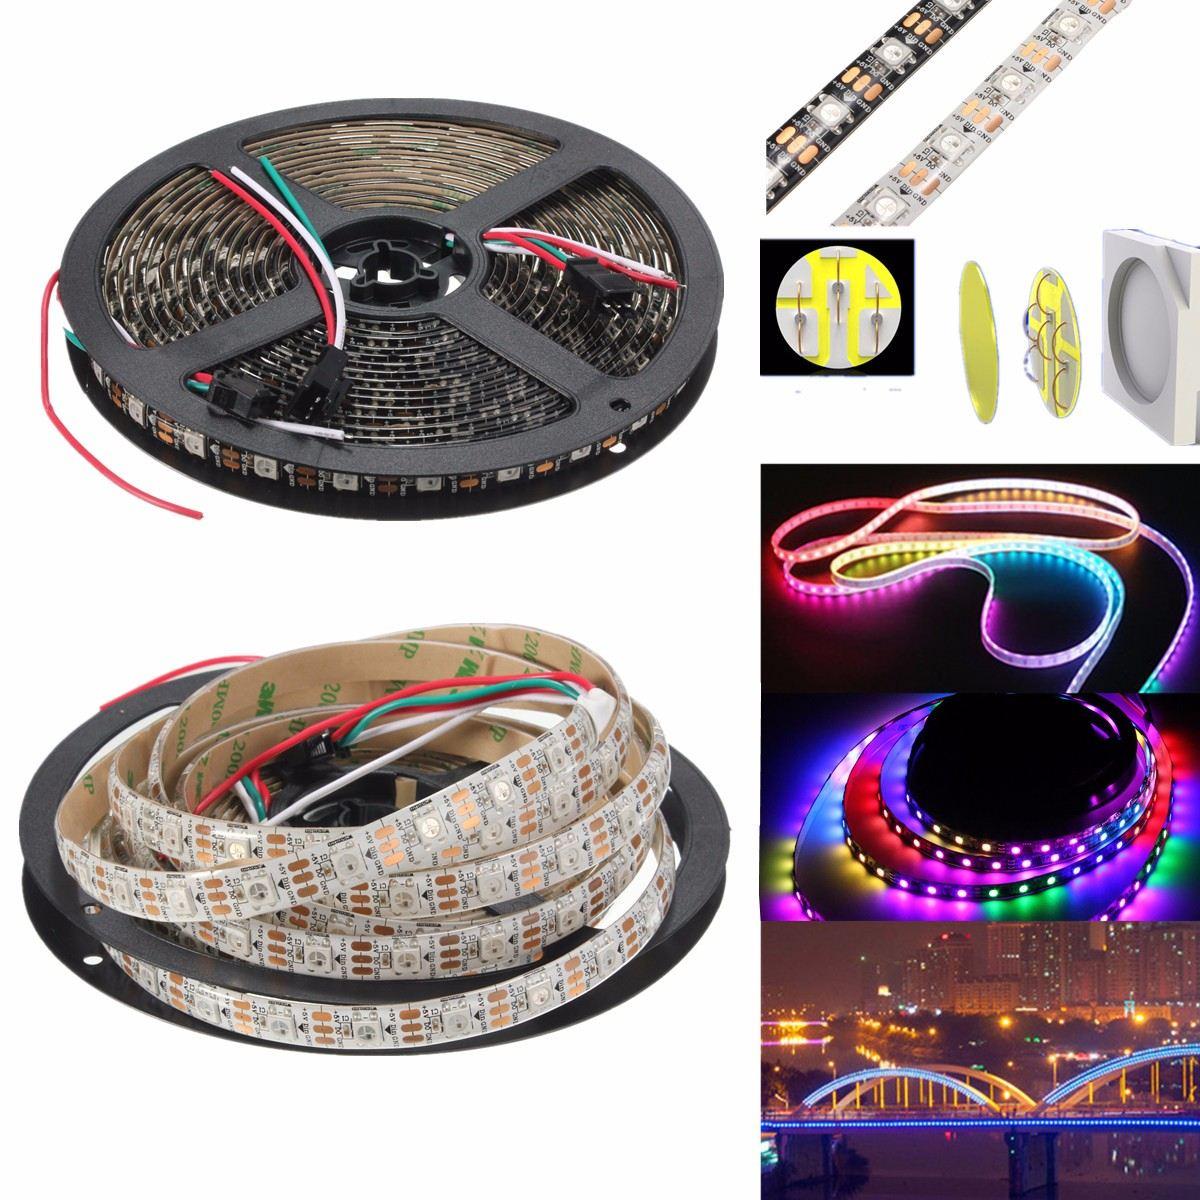 72W Super Bright LED Strip Light 4M 240LEDS WS2812B 5050 RGB Waterproof IP65 LED Strip Light Individual Addressable DC 5V